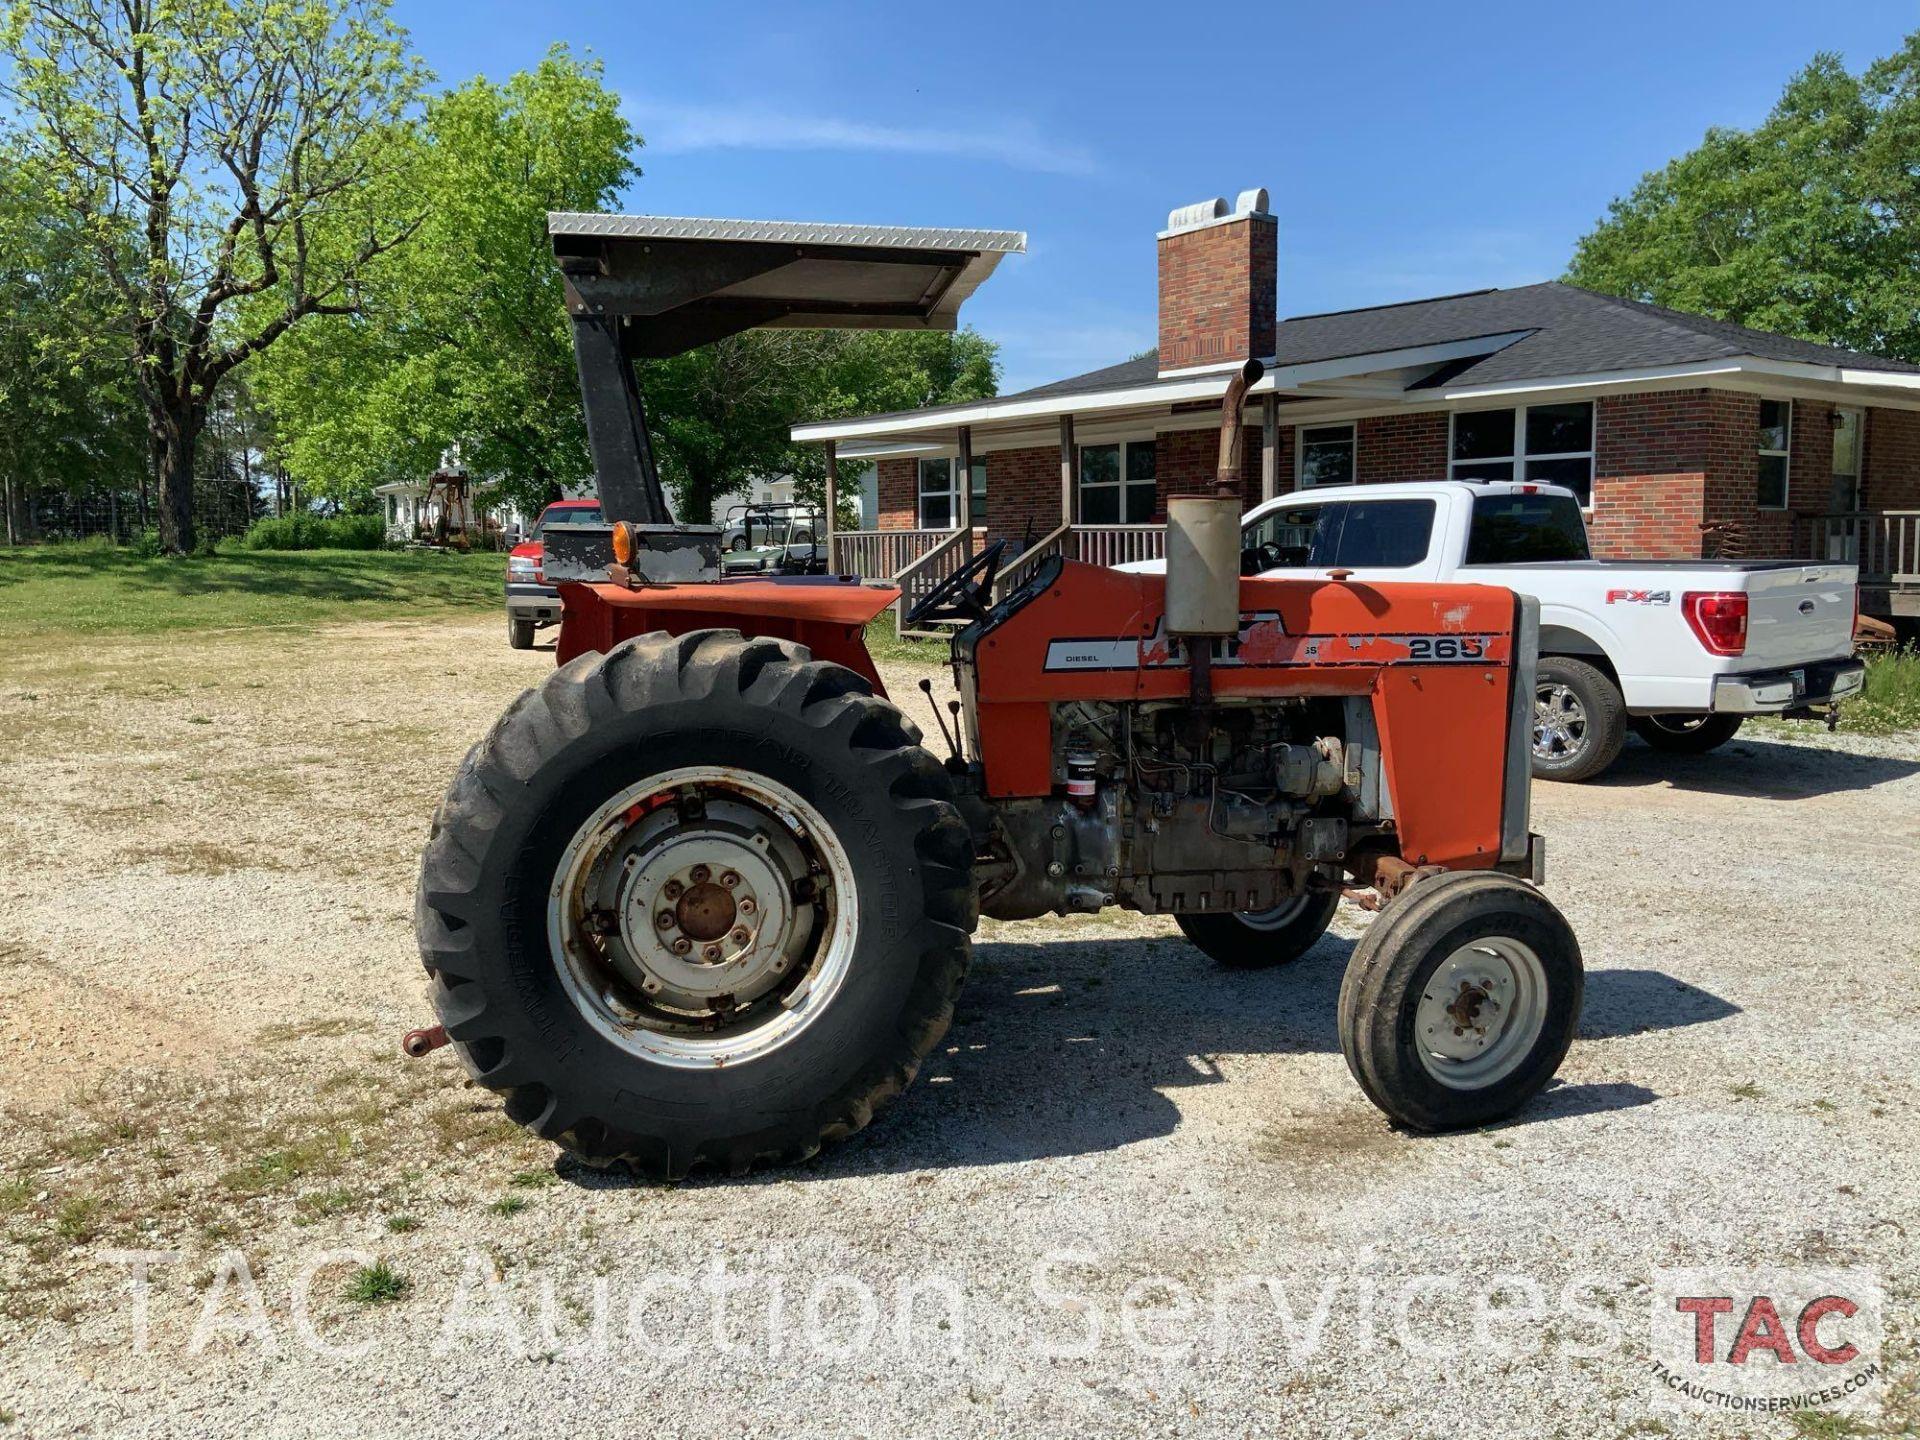 Massey Ferguson 265 FarmTractor - Image 10 of 23